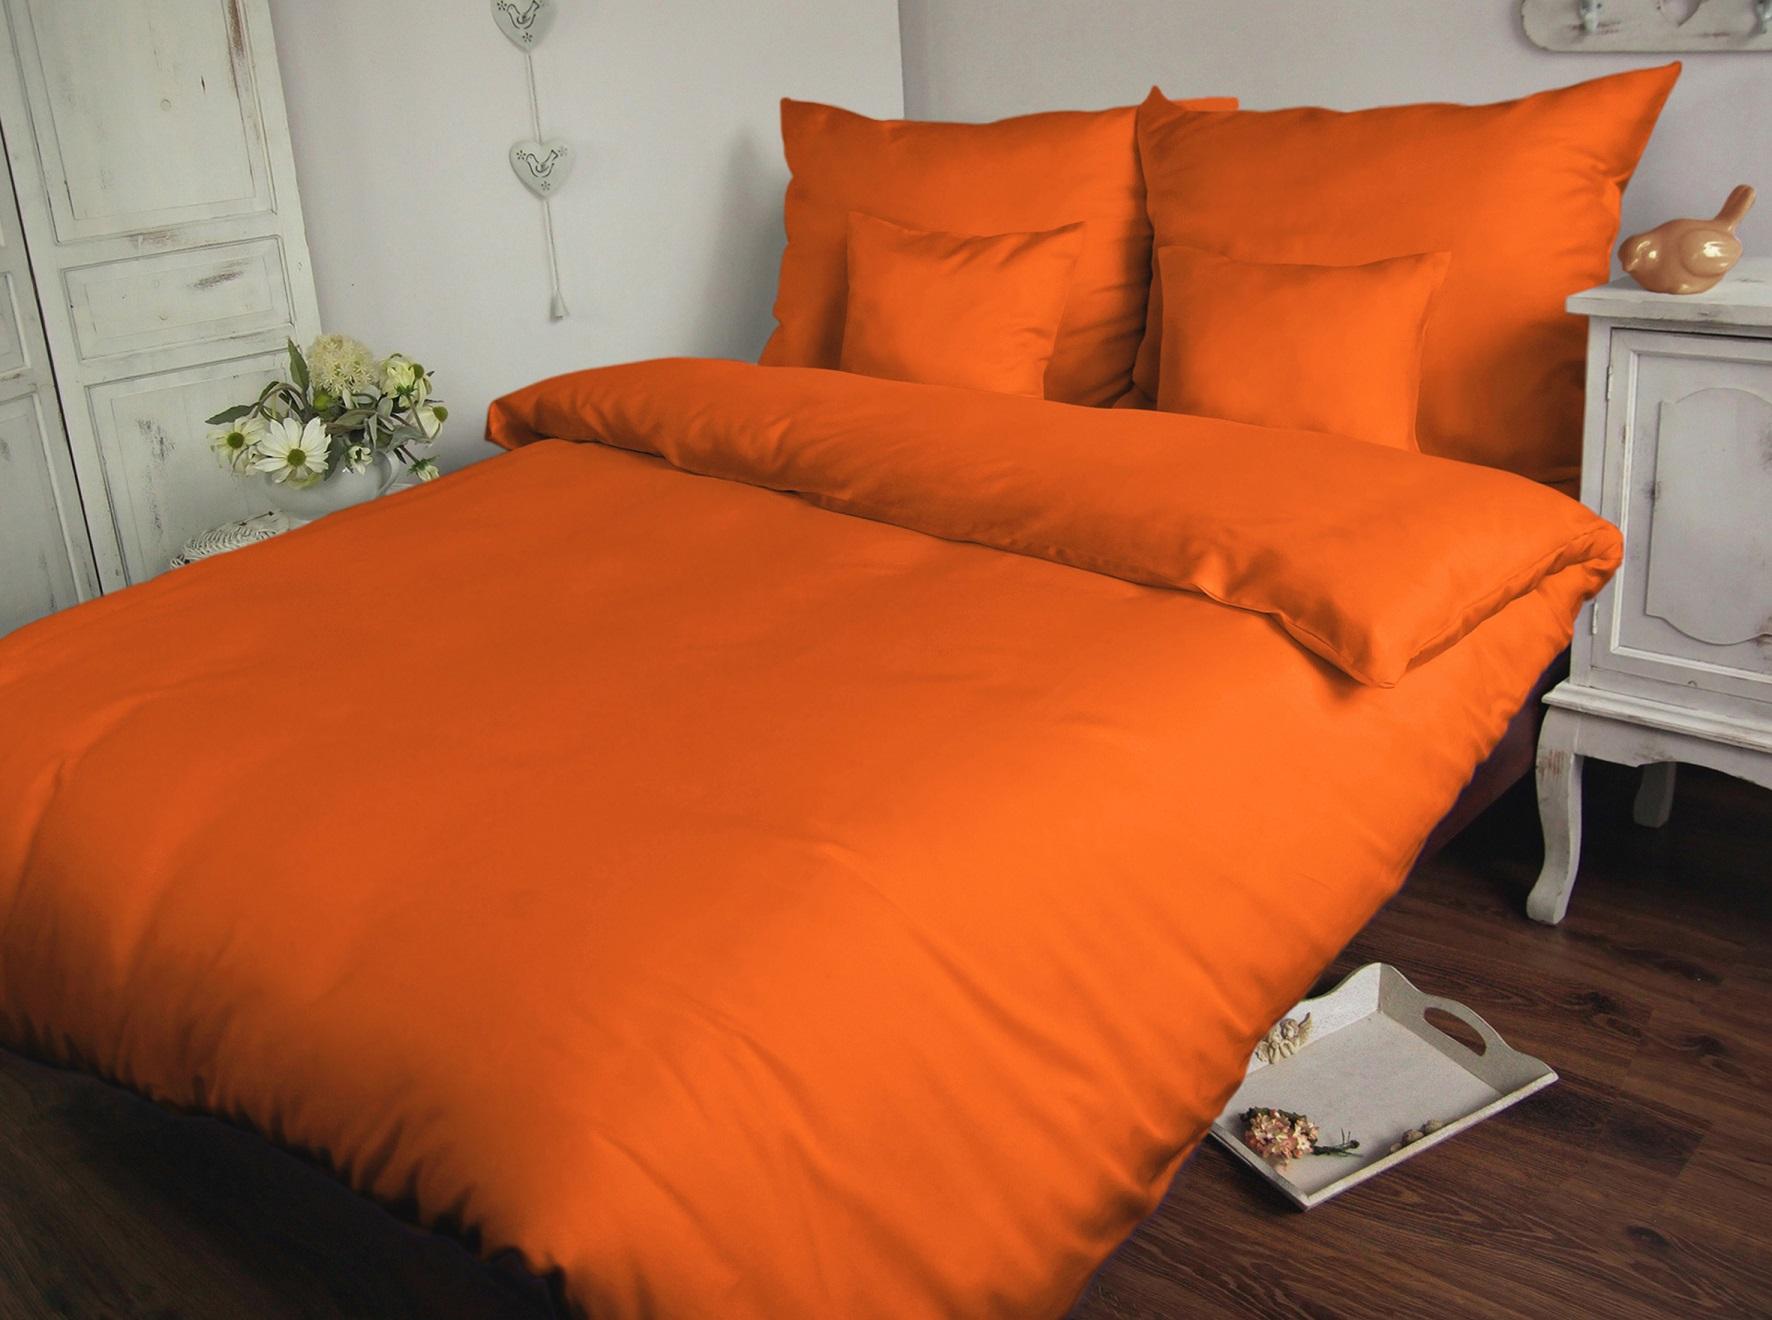 Obliečka orange